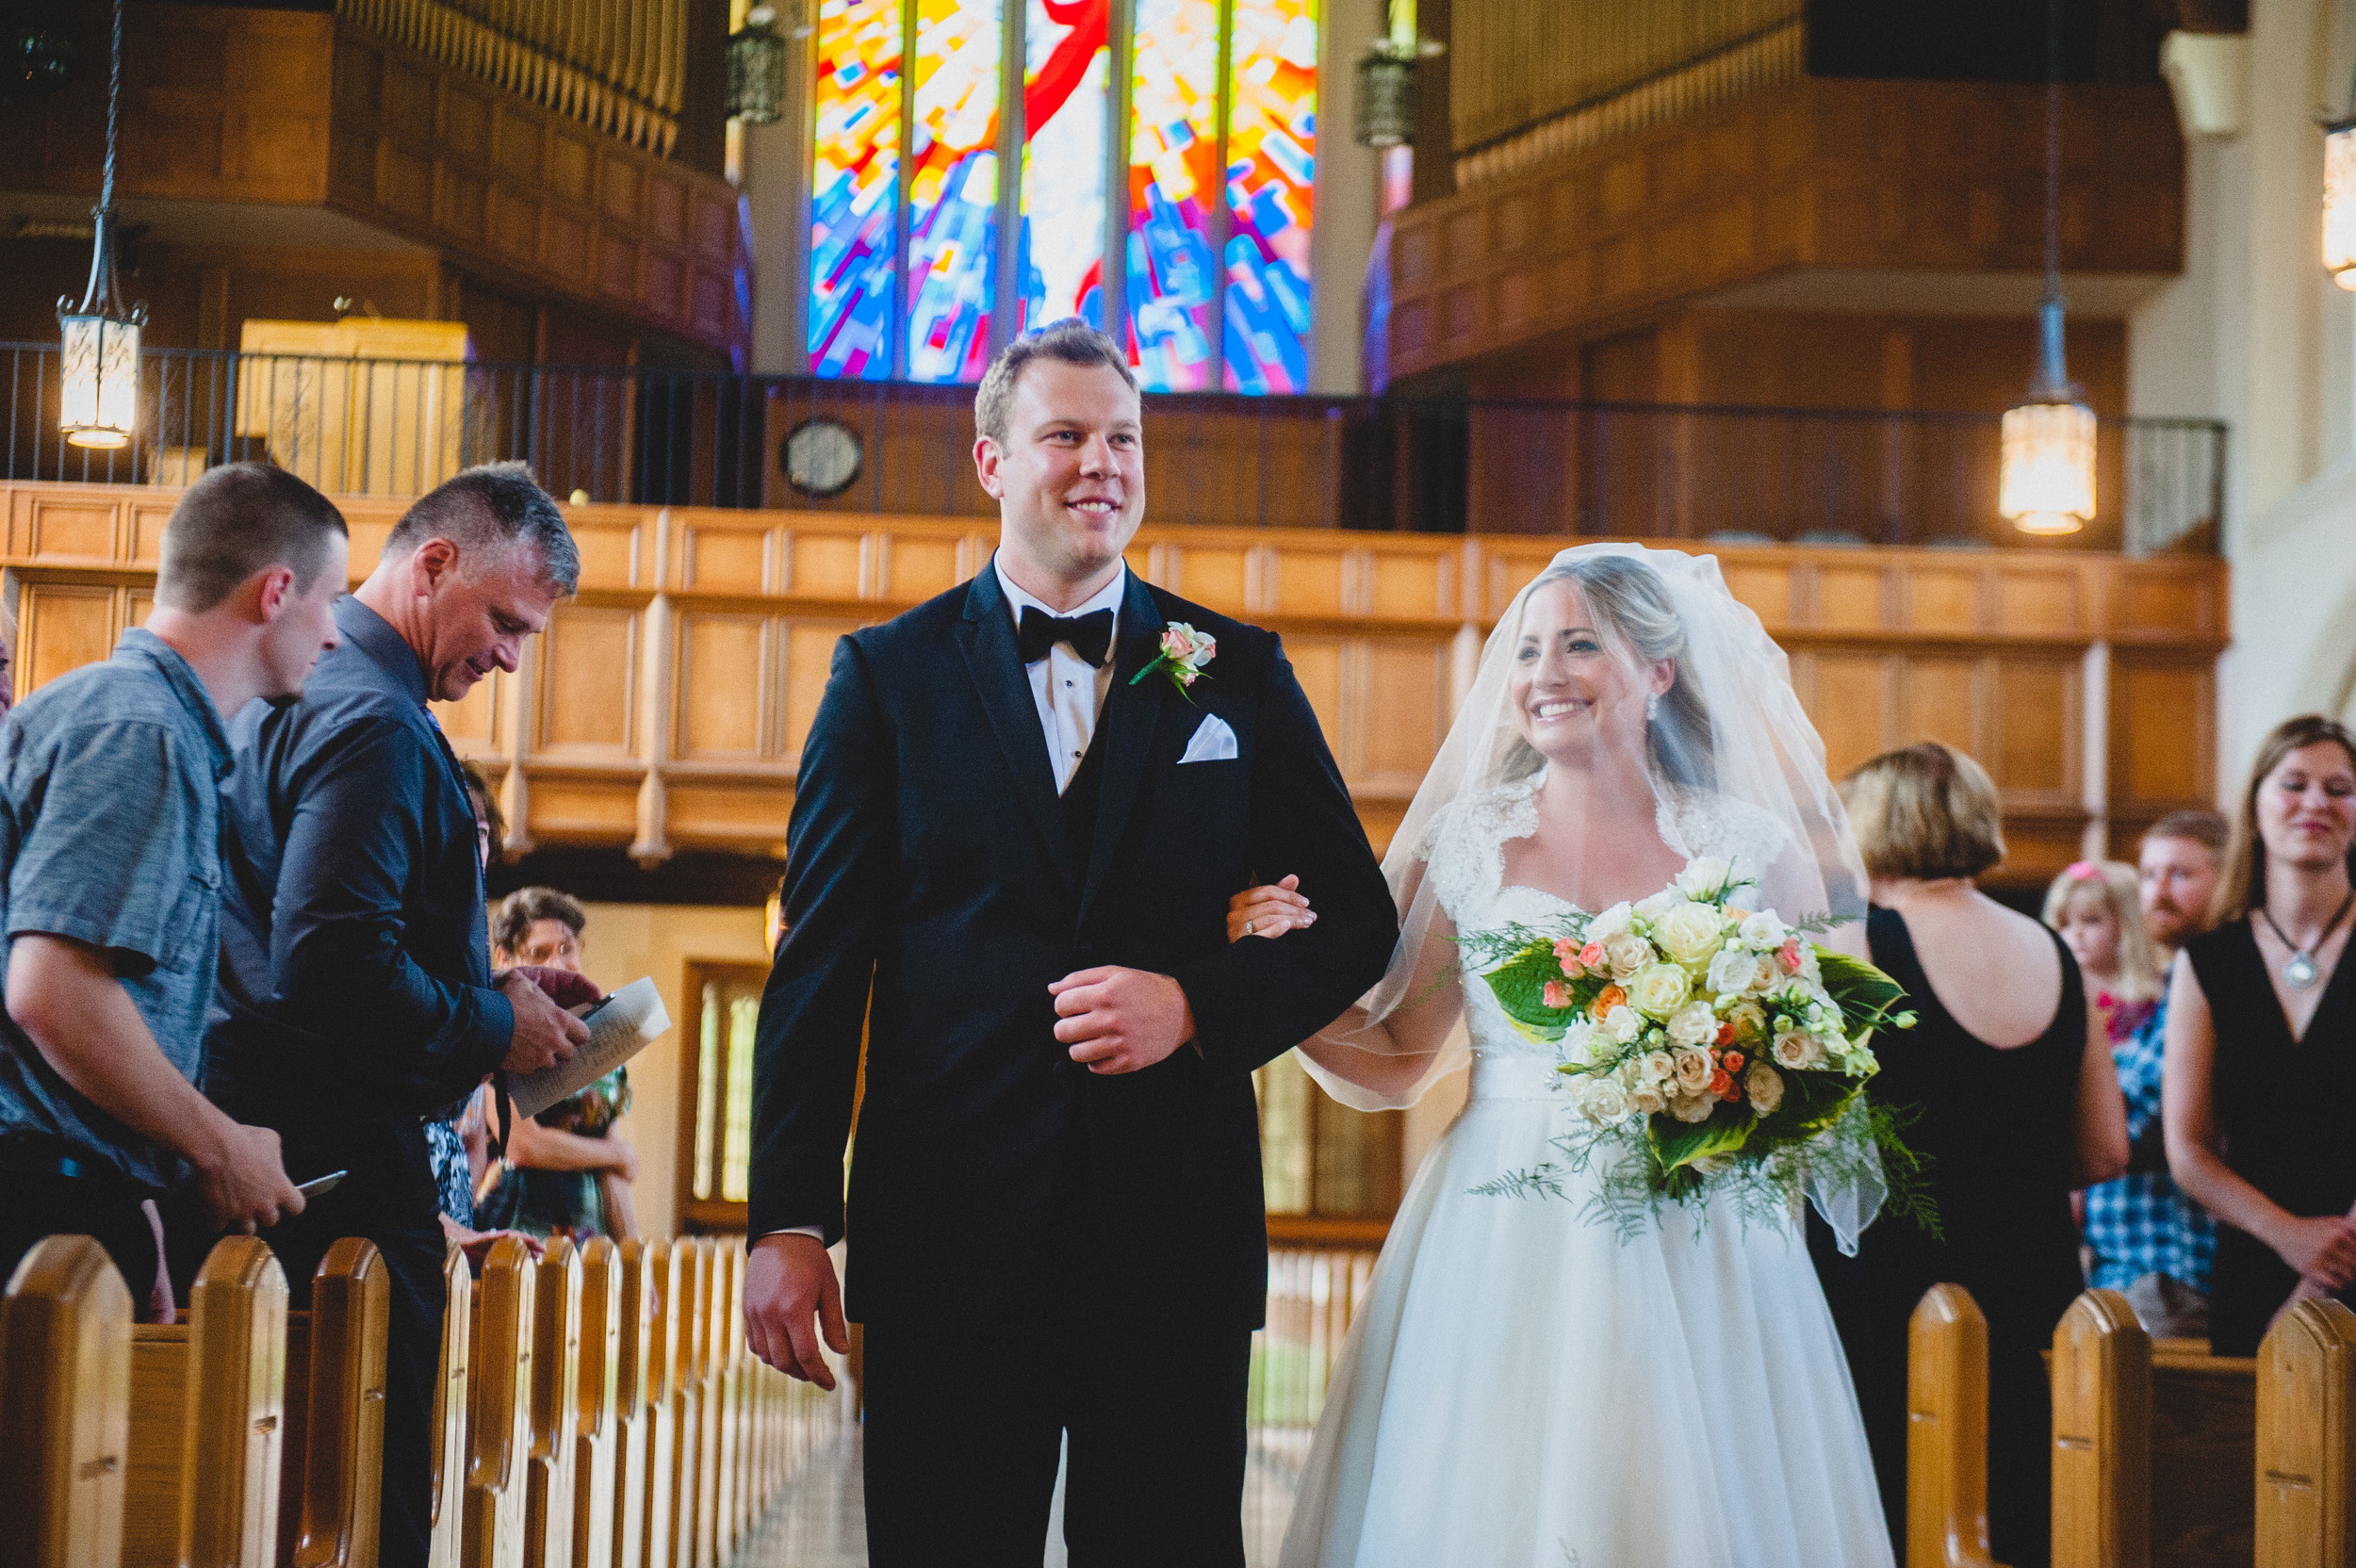 Vancouver St Augustine 's Church wedding photographer edward lai photography-30.jpg